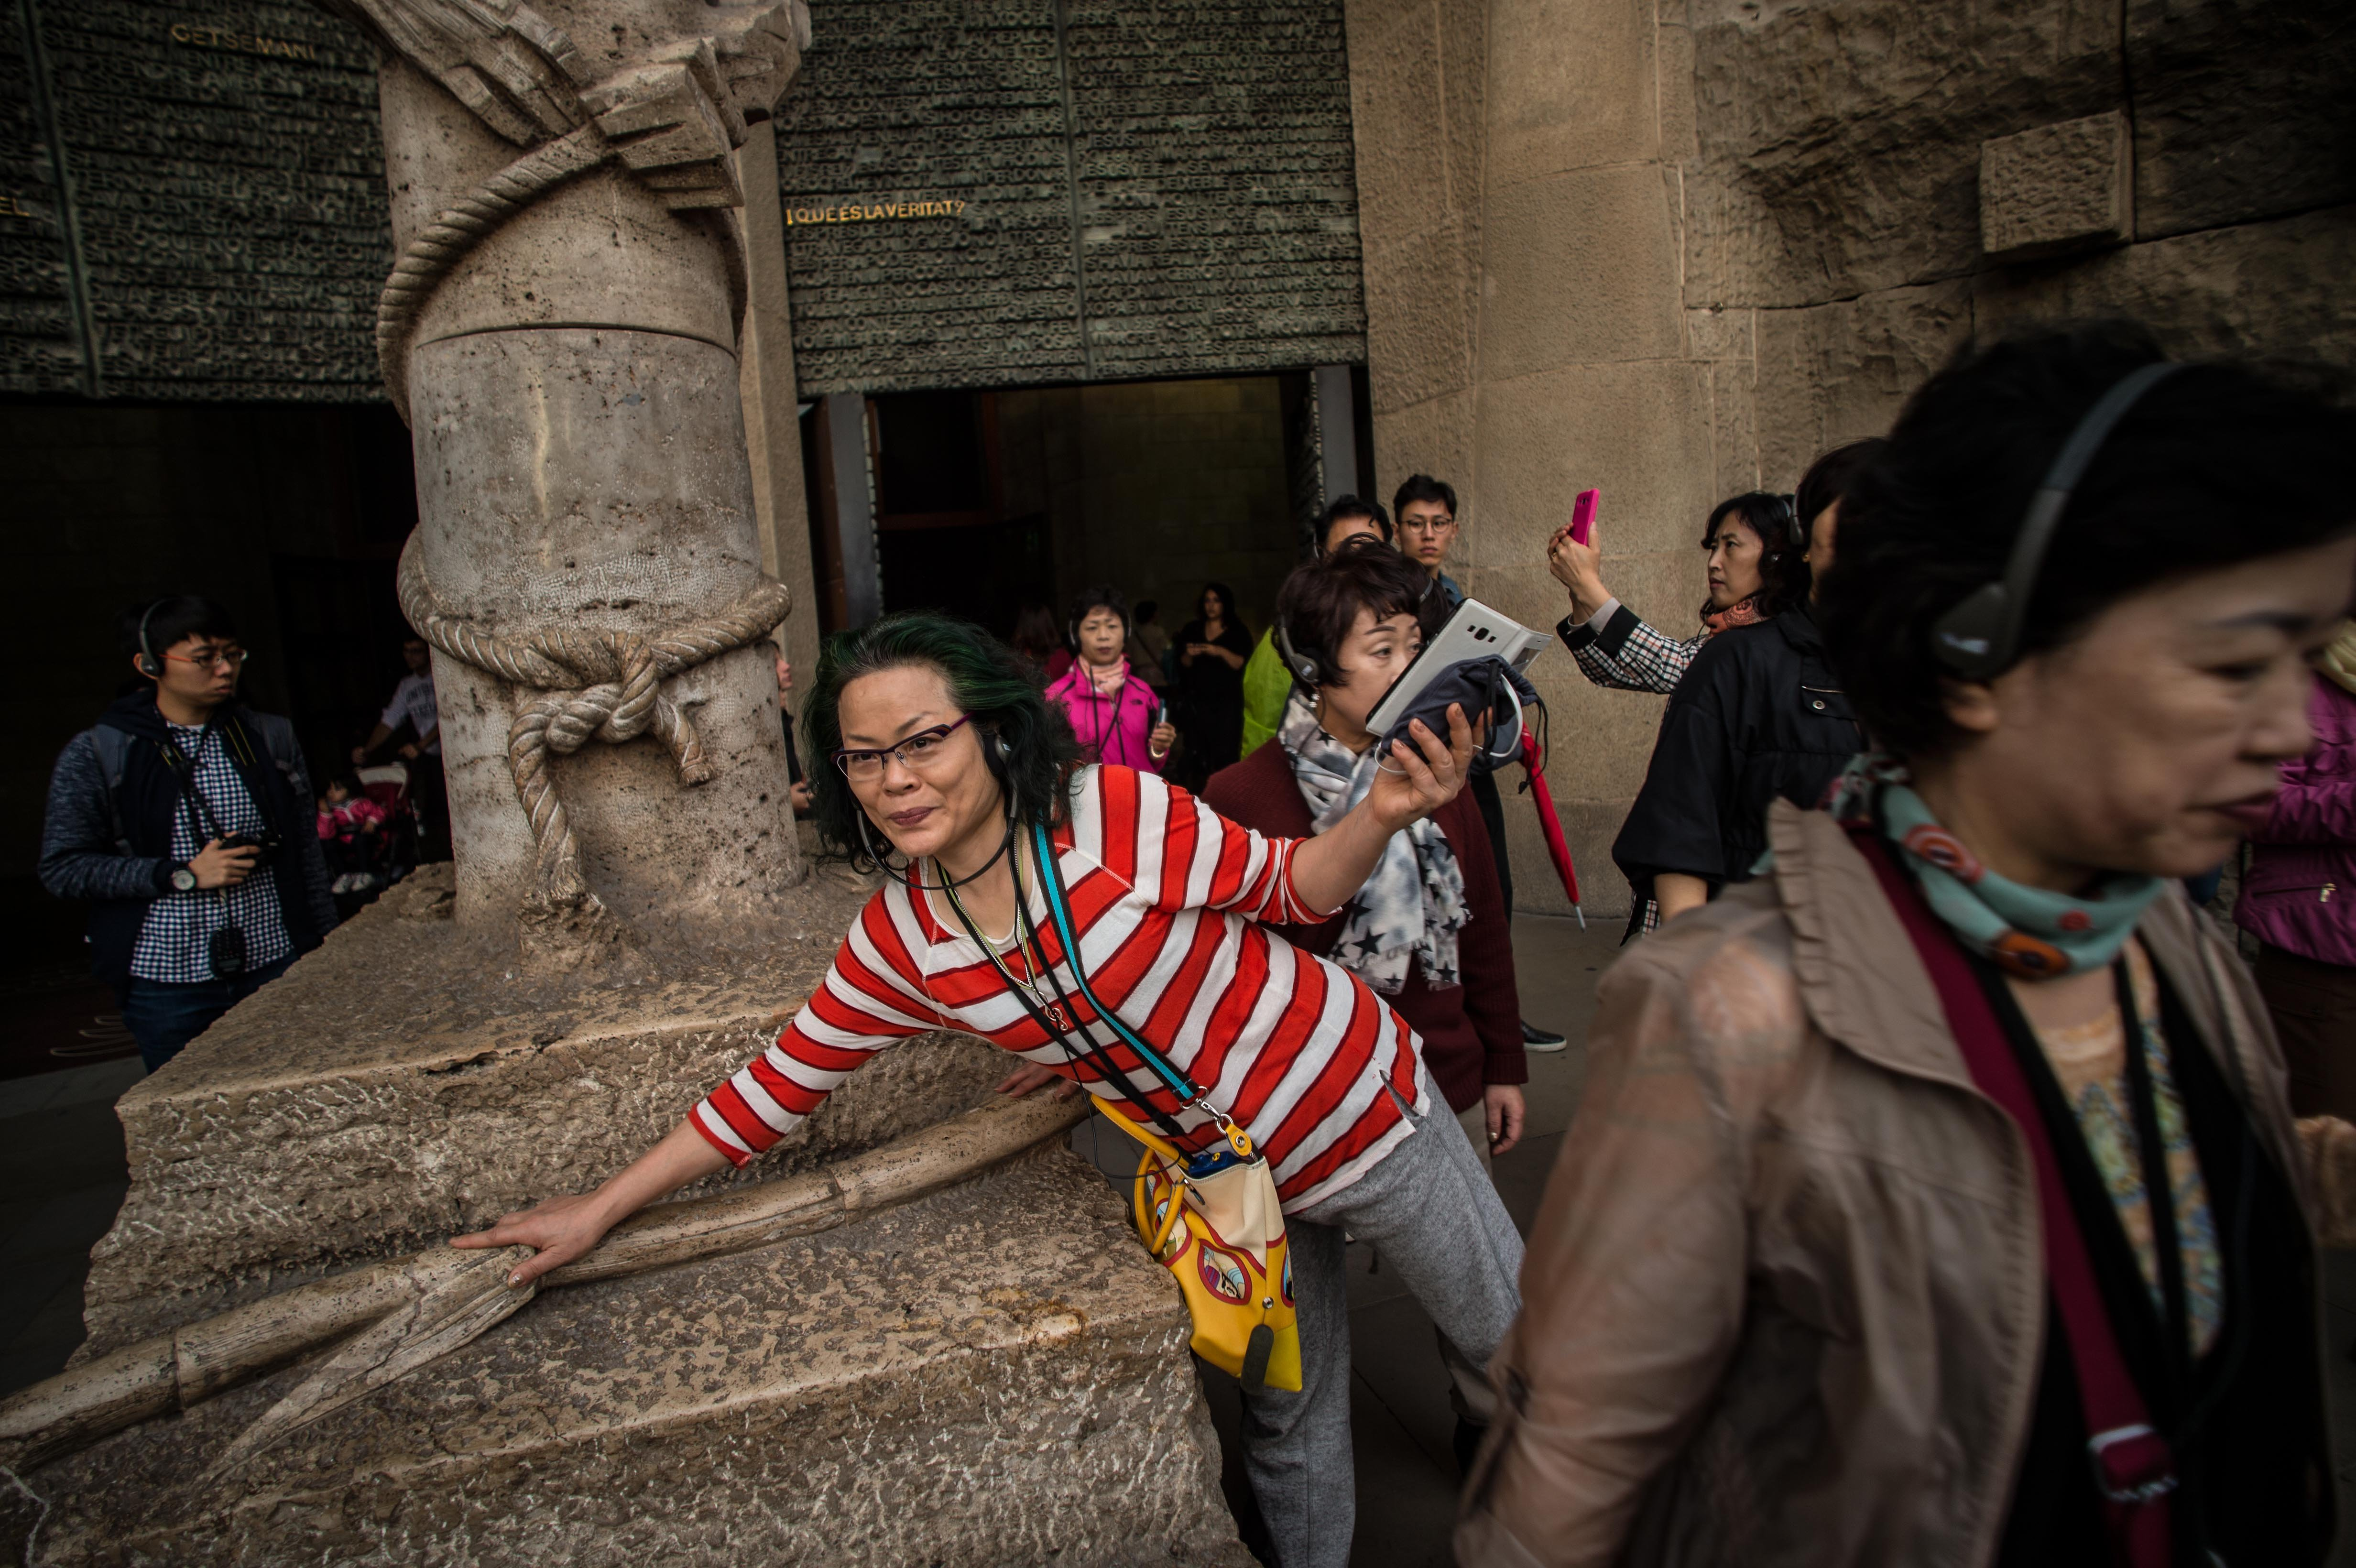 Tourists visit 'La Sagrada Familia' in Barcelona on Oct. 26, 2015.